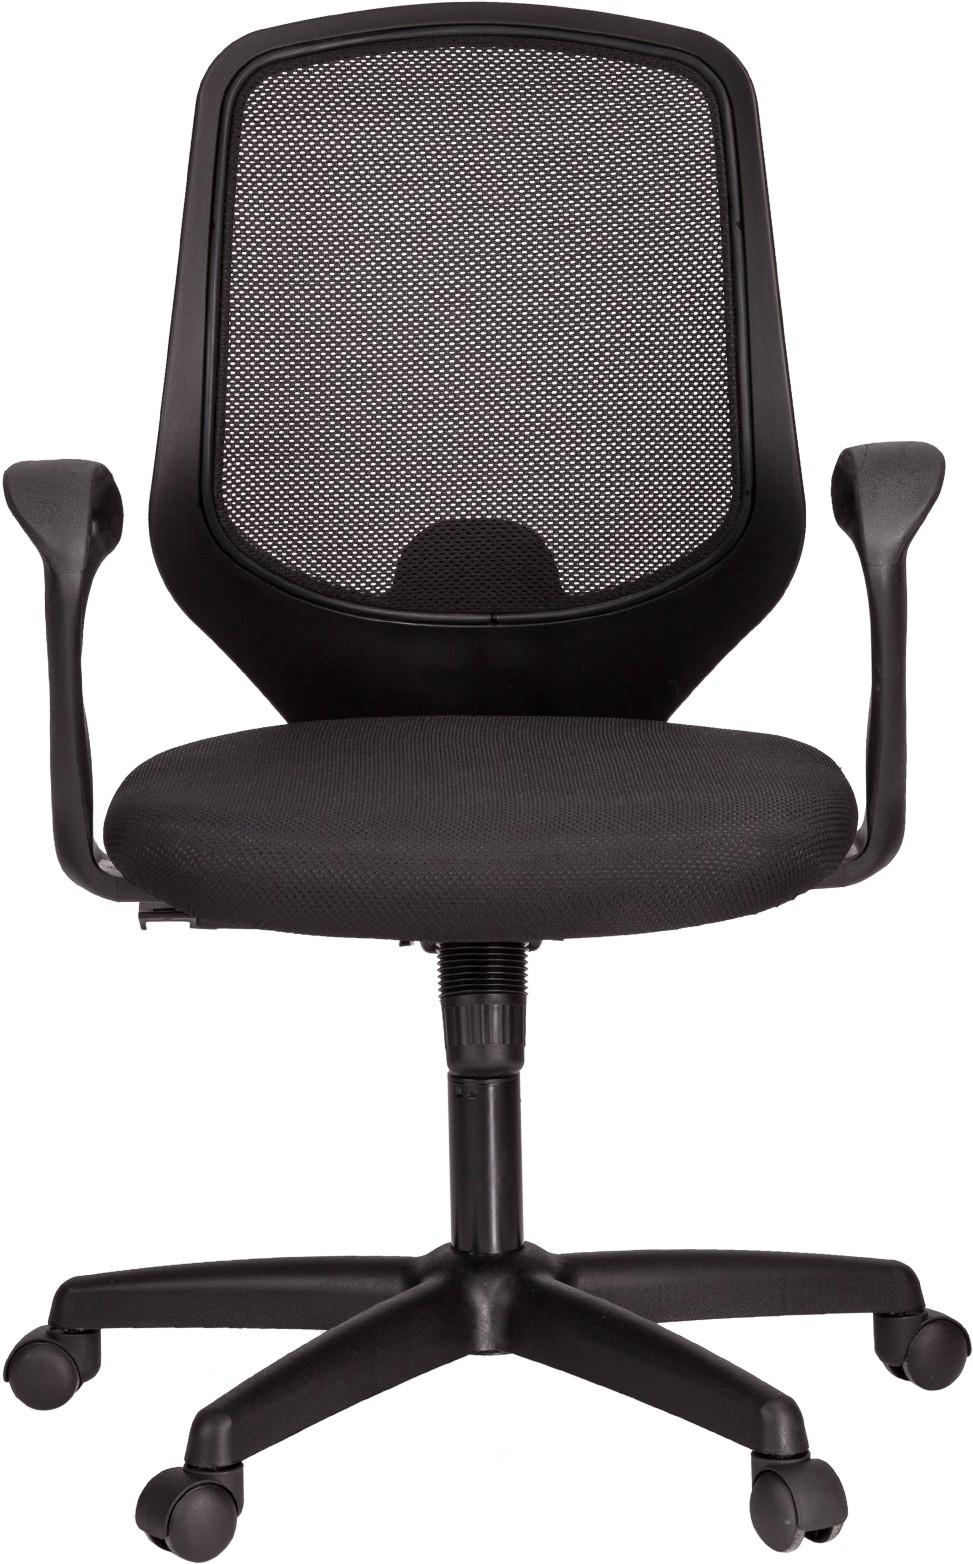 View Ergoline MINT Leatherette Office Chair(Black) Furniture (Ergoline)